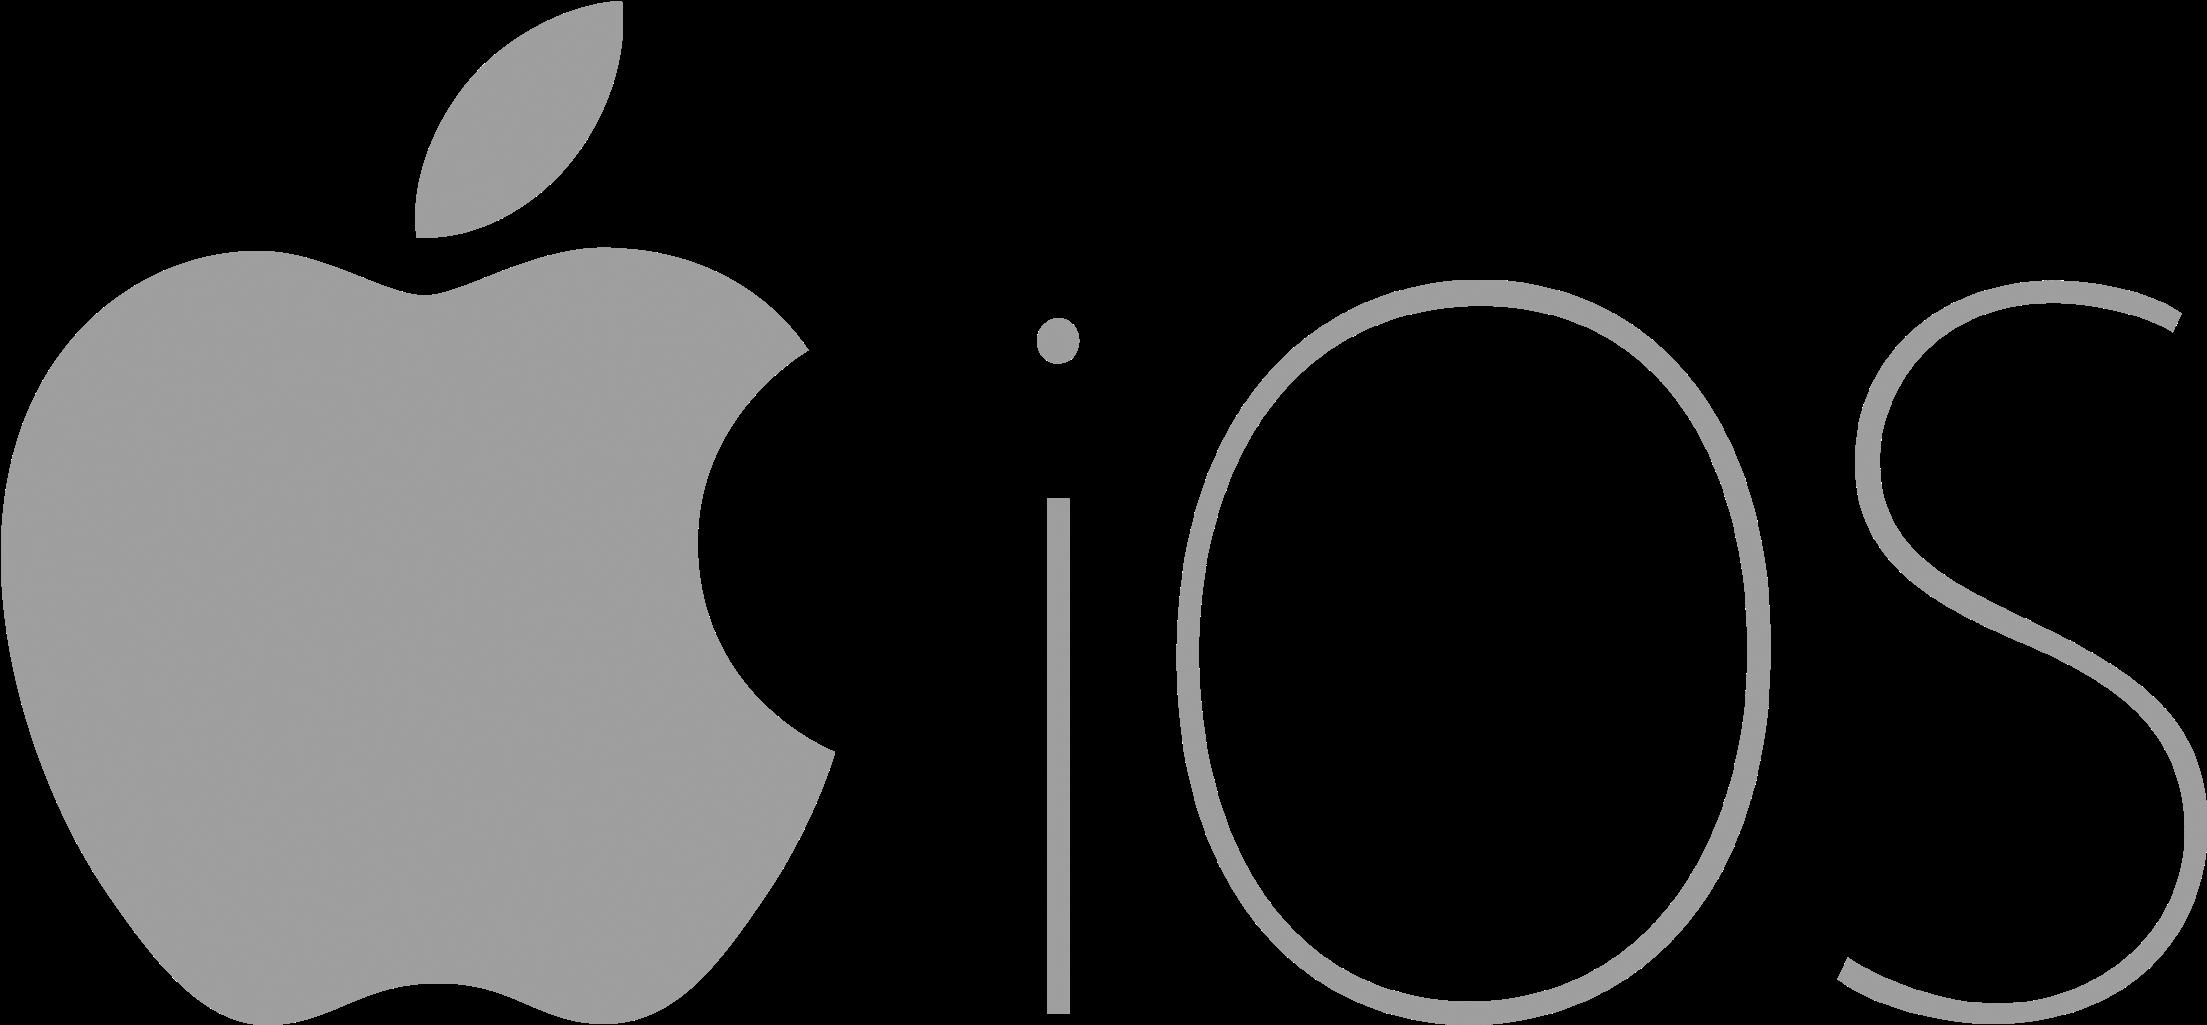 62-627056_ios-11-logo-png